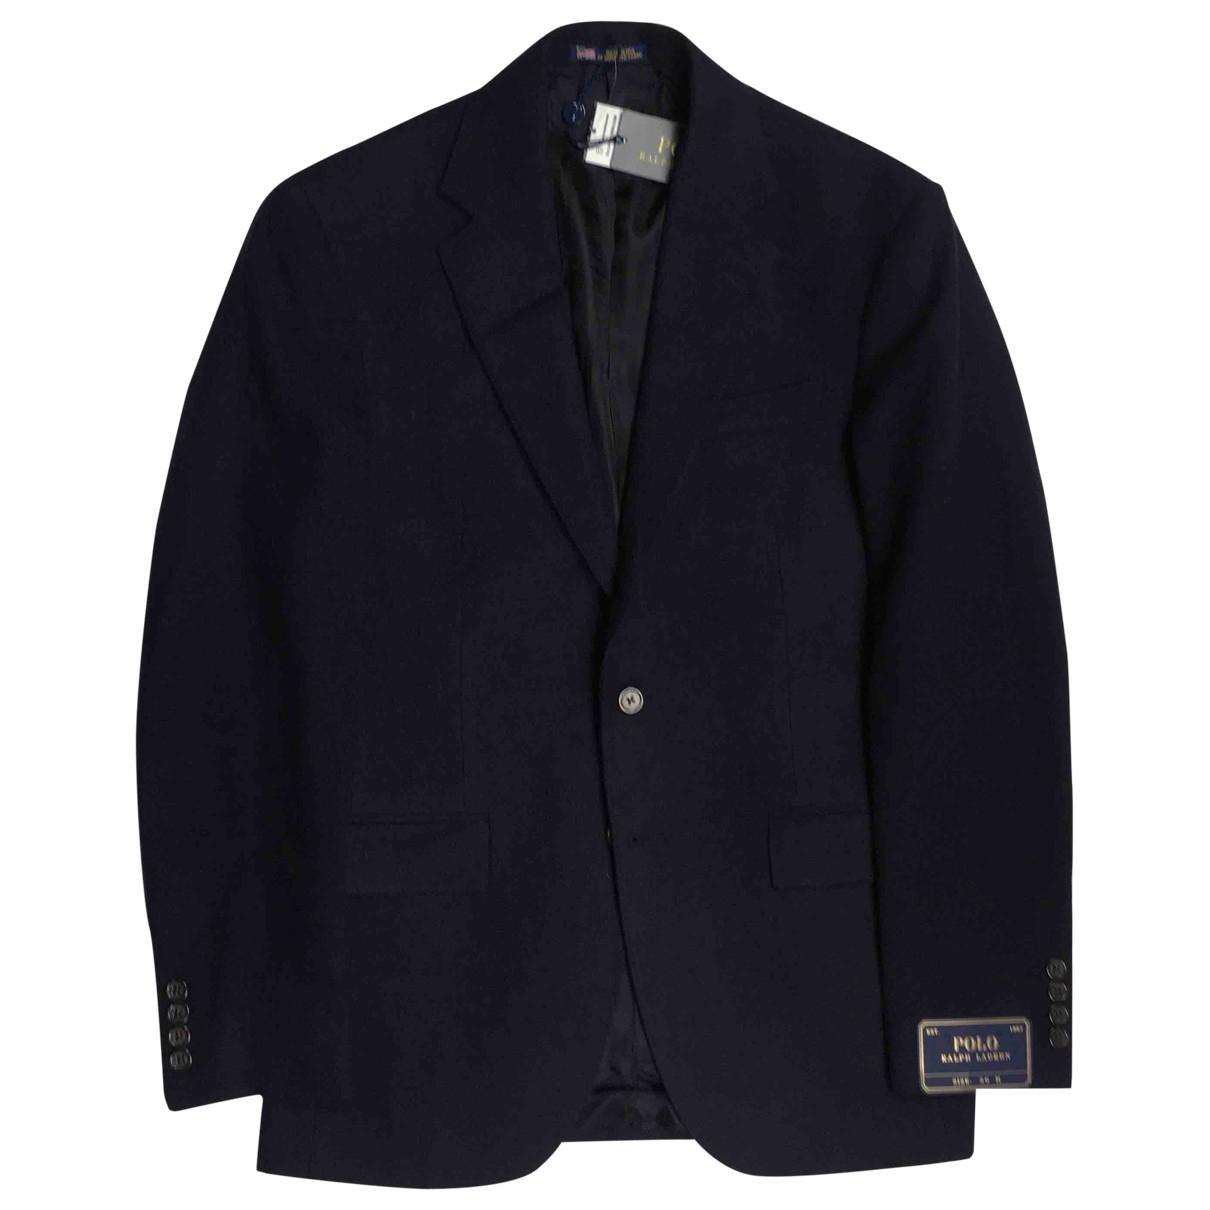 Polo Ralph Lauren \N Navy Cashmere jacket  for Men 44 UK - US